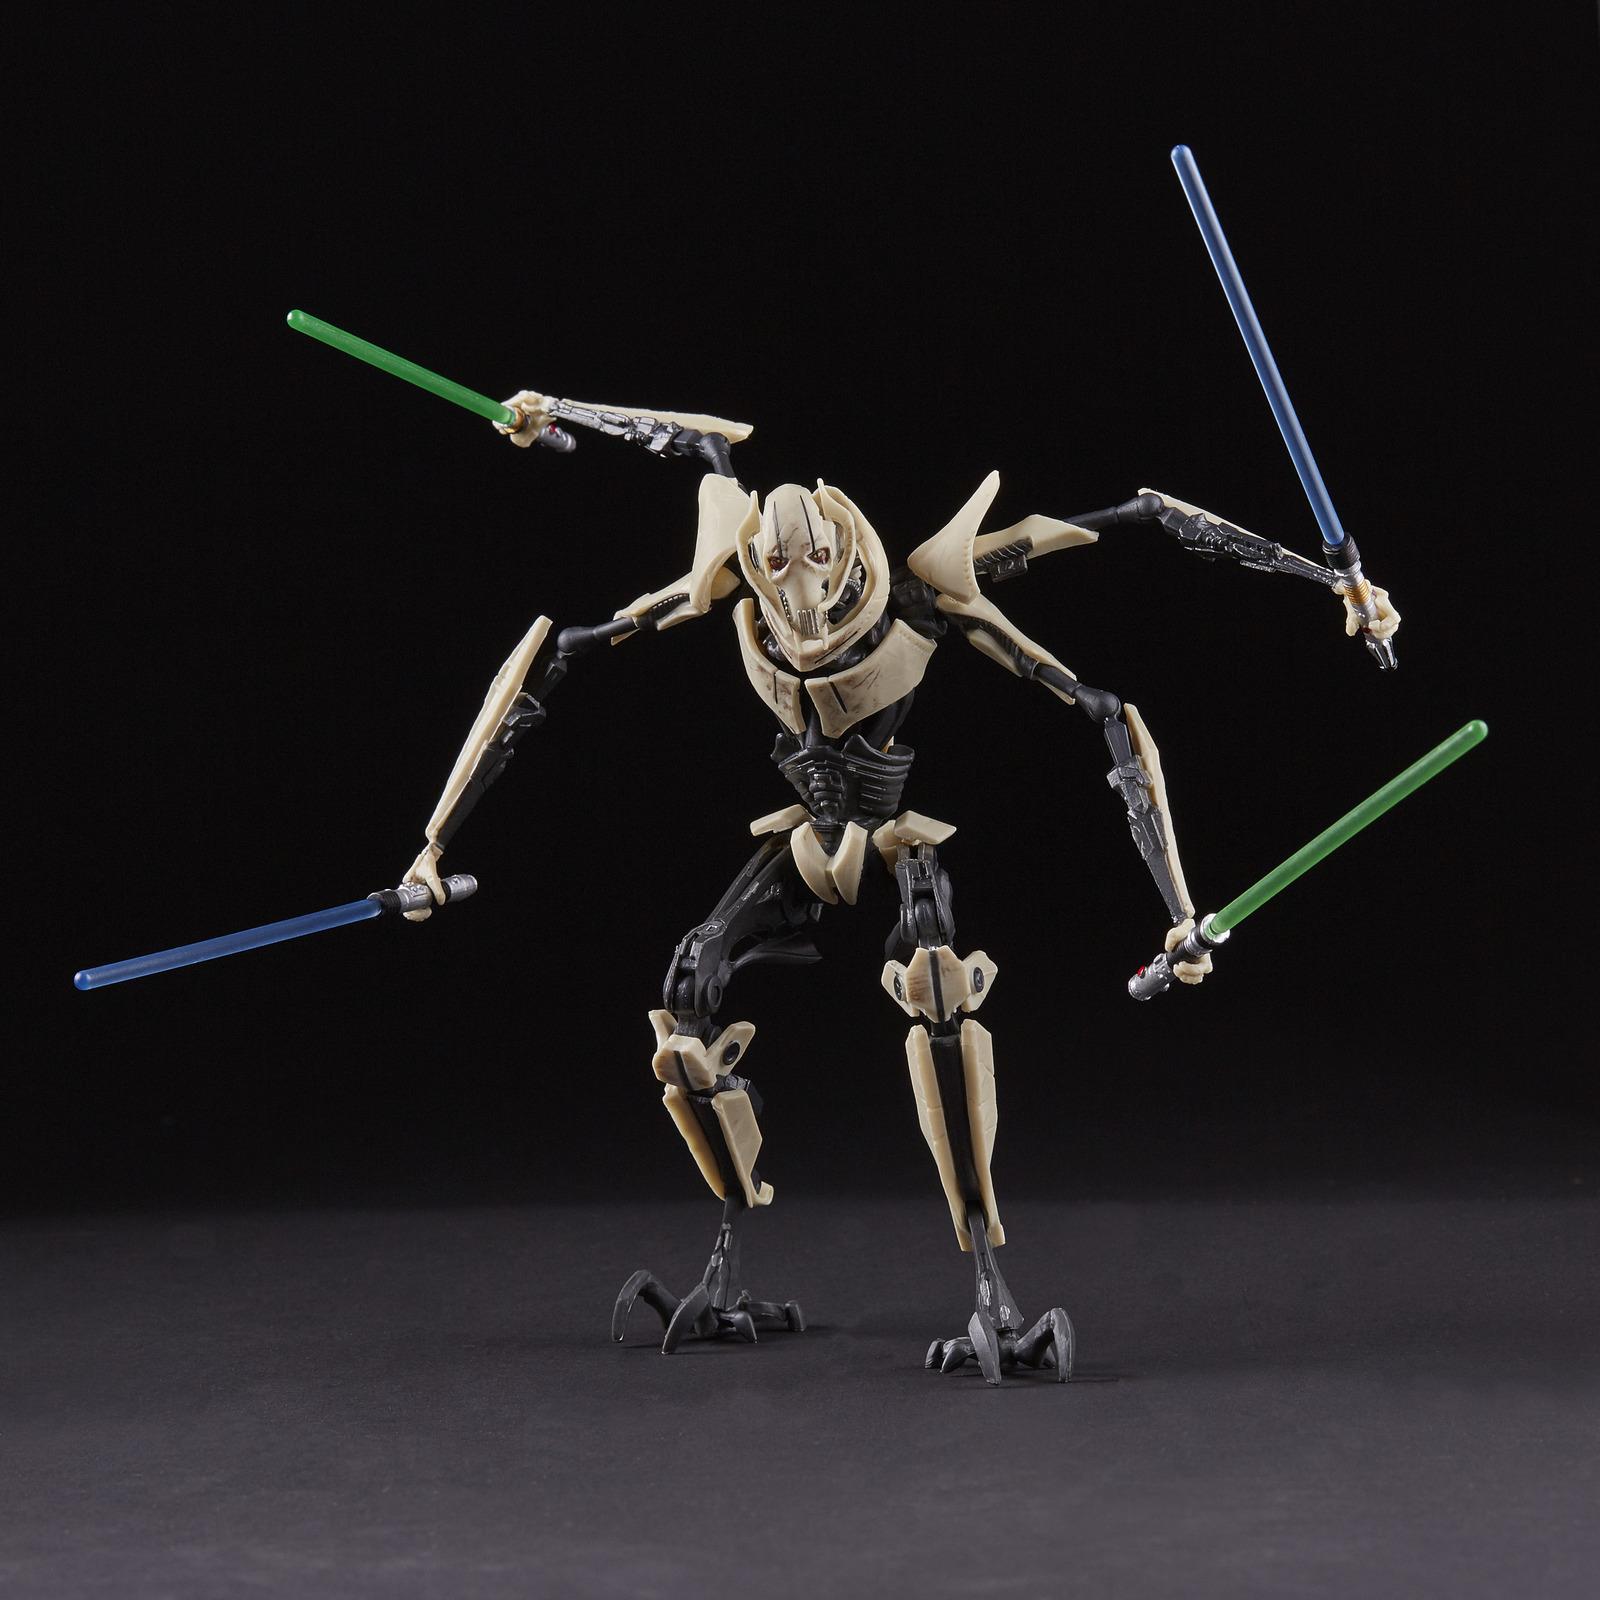 Star Wars The Black Series: General Grievous - Deluxe Figure image